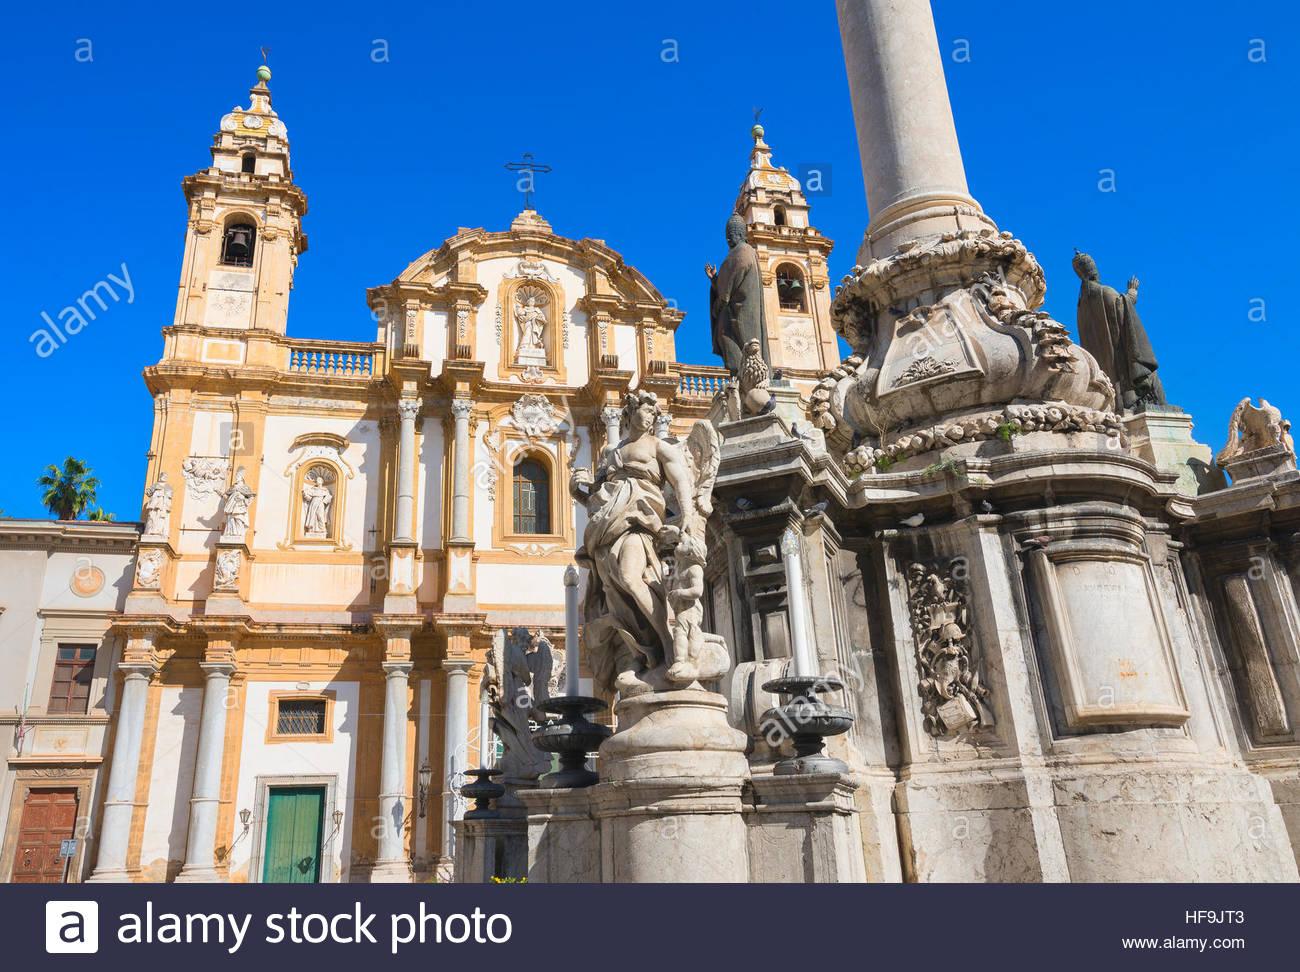 Iglesia de San Domenico, Palermo, Sicilia, Italia, Europa Imagen De Stock